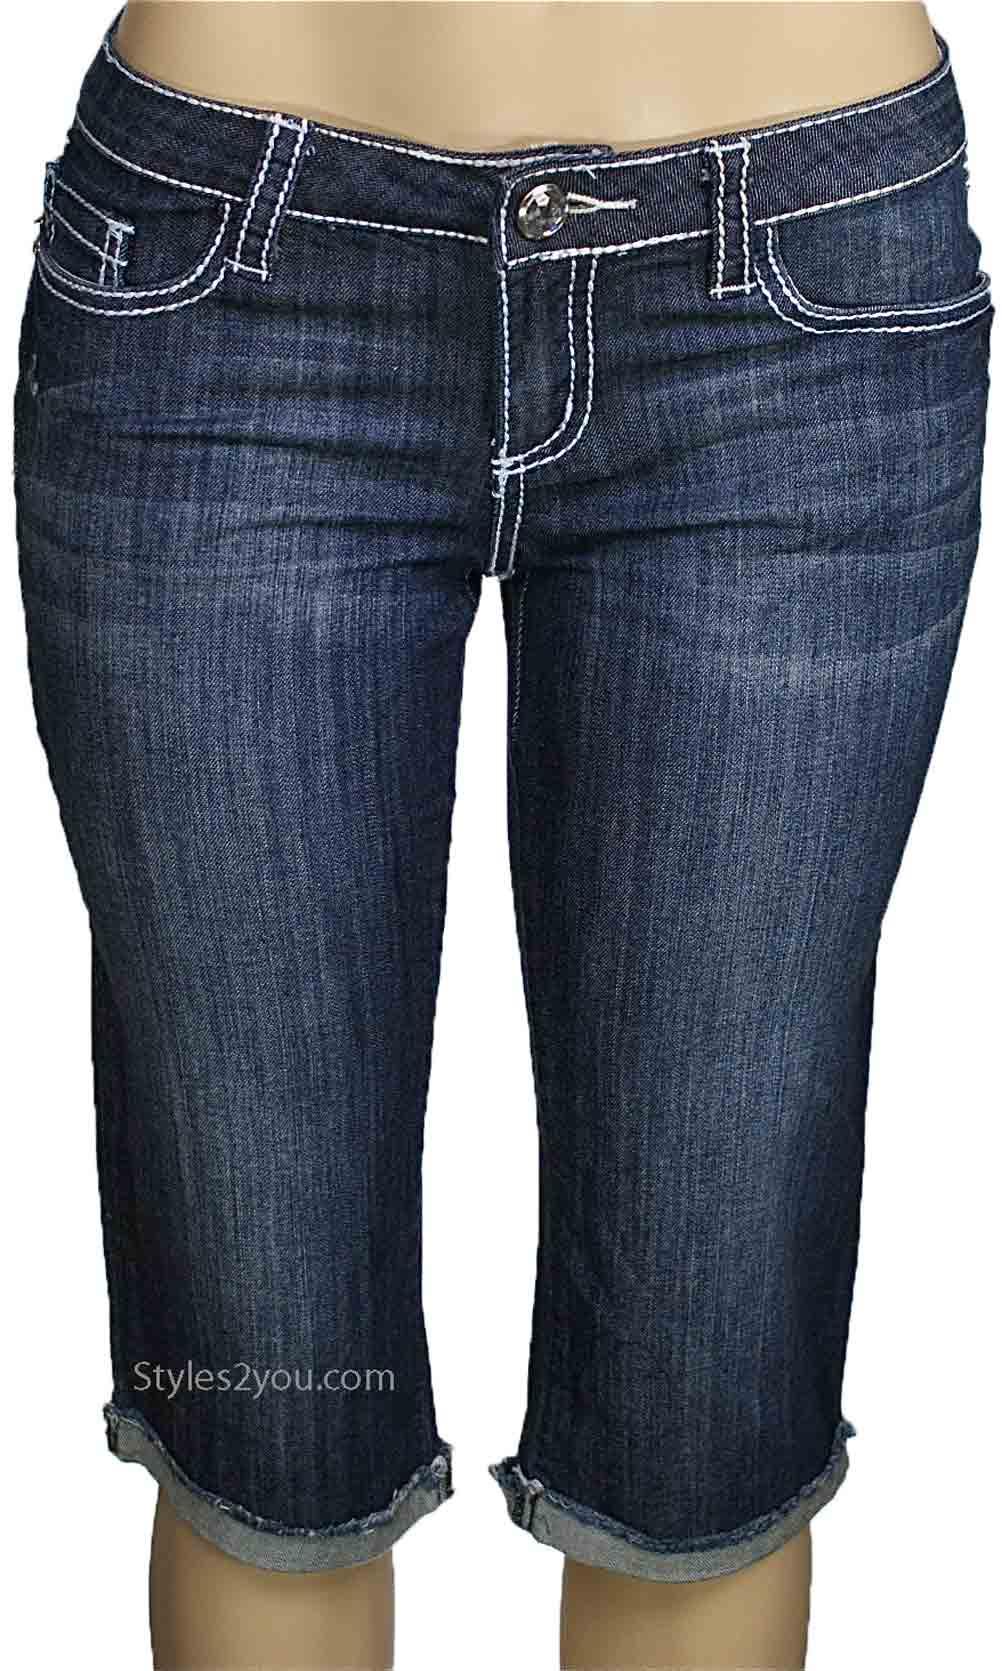 Nina Ladies Denim Cut Off Bermuda Shorts YMI Jean Shorts YMI Jeans ...